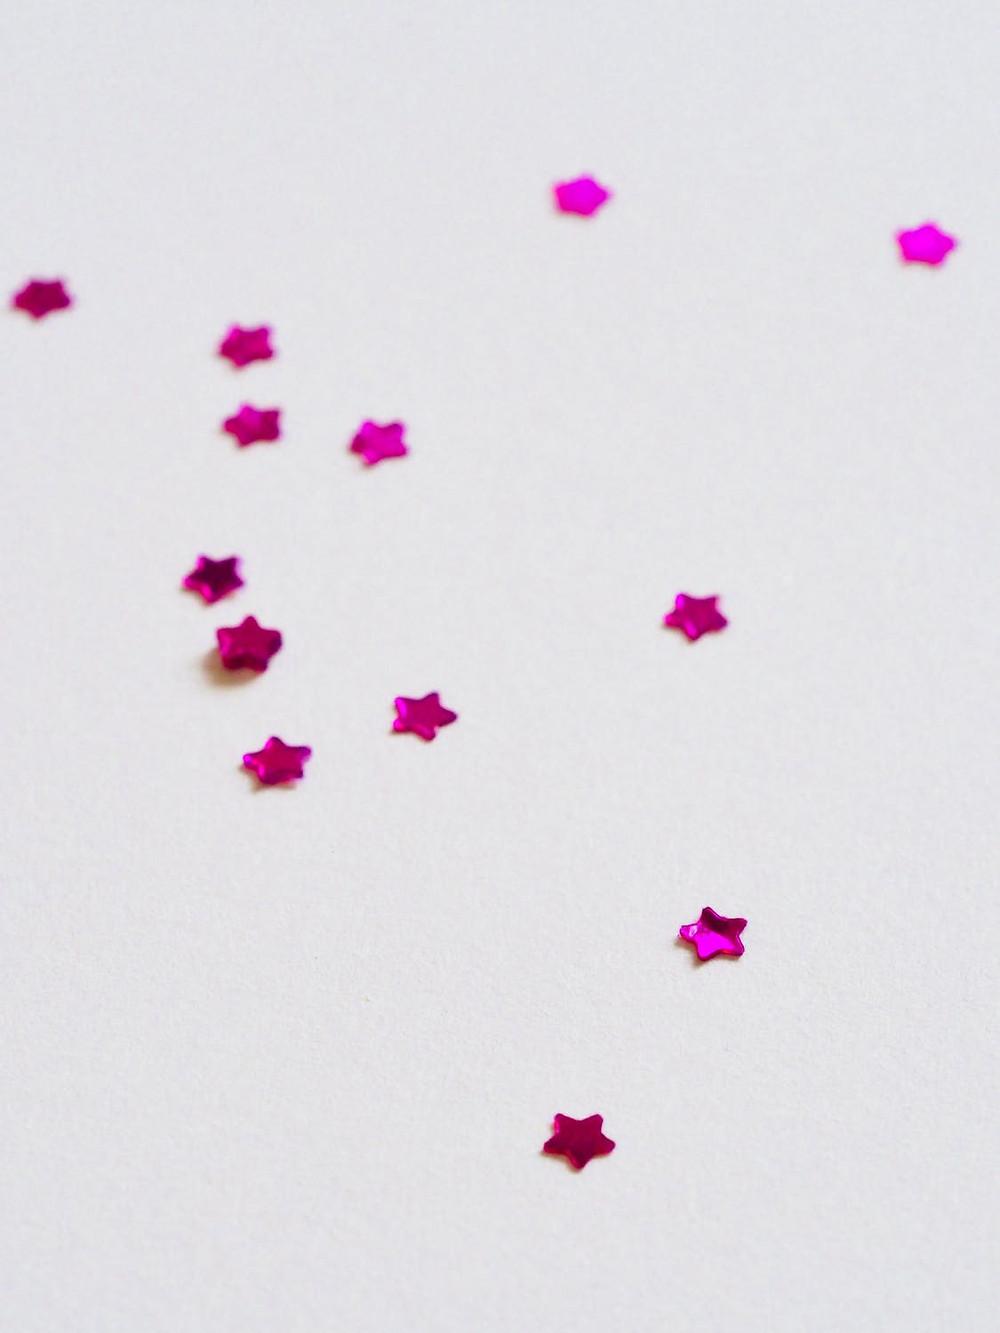 pink stars on white background